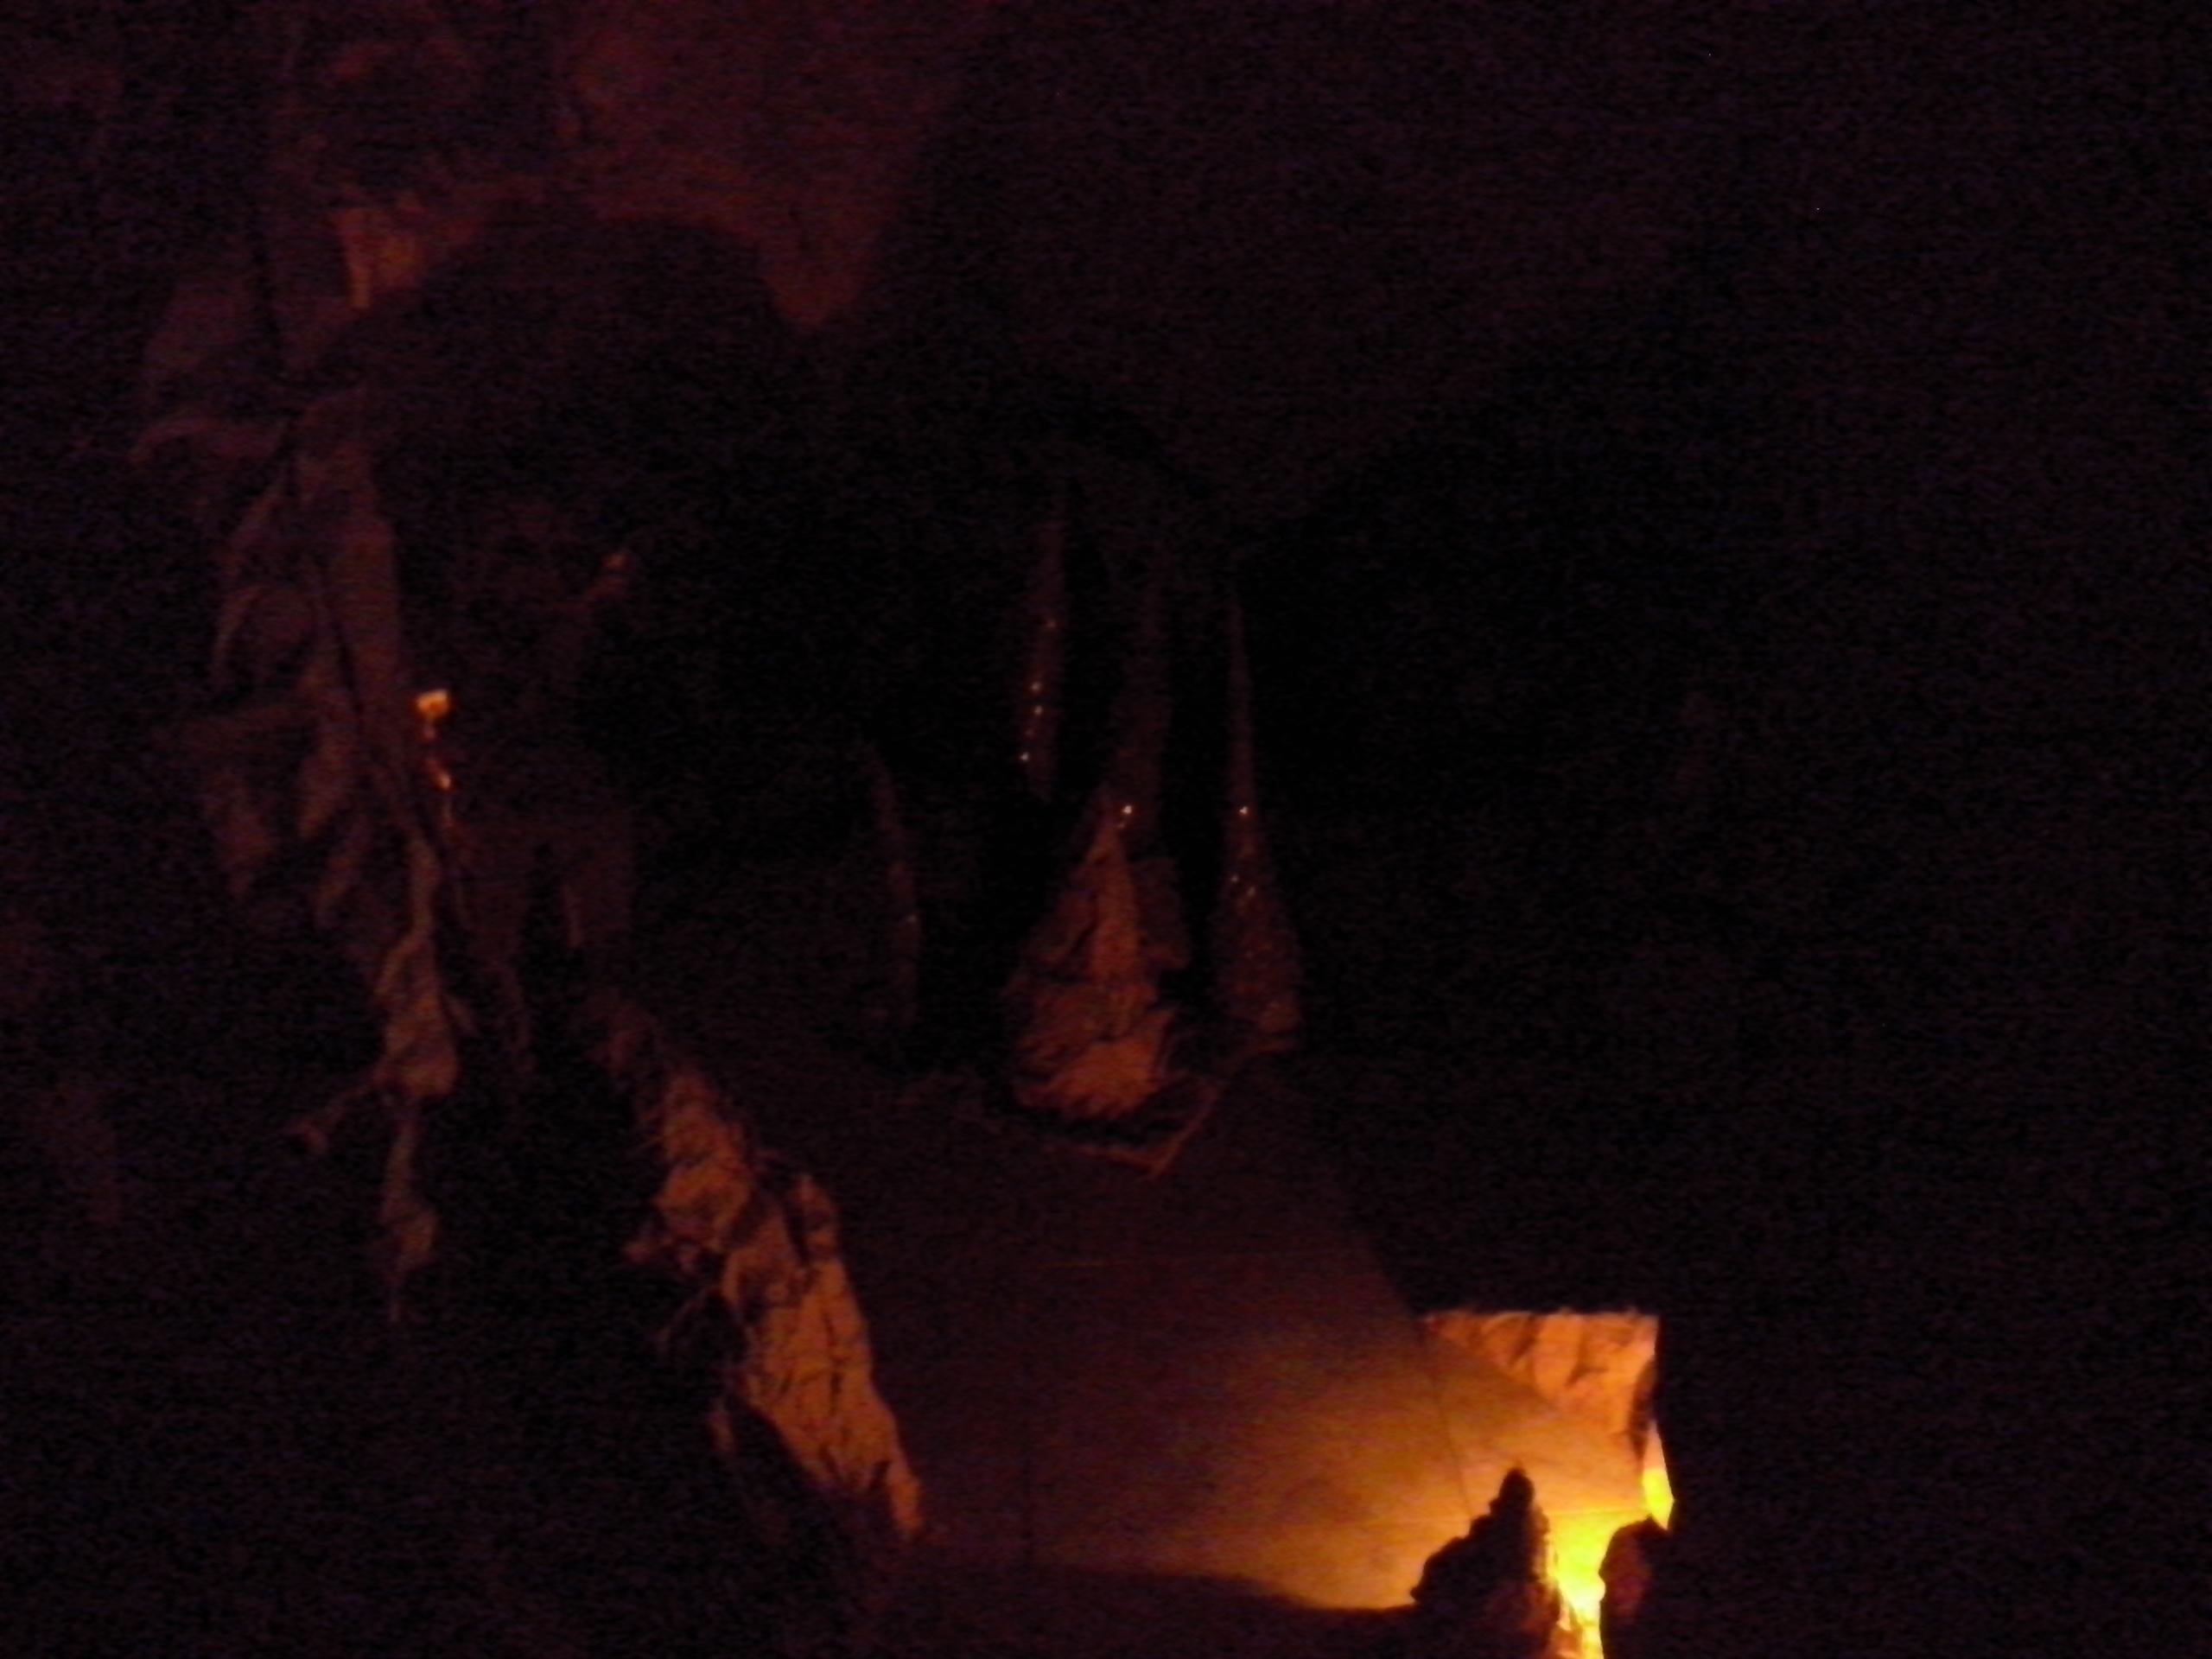 Caverna artificial por dentro